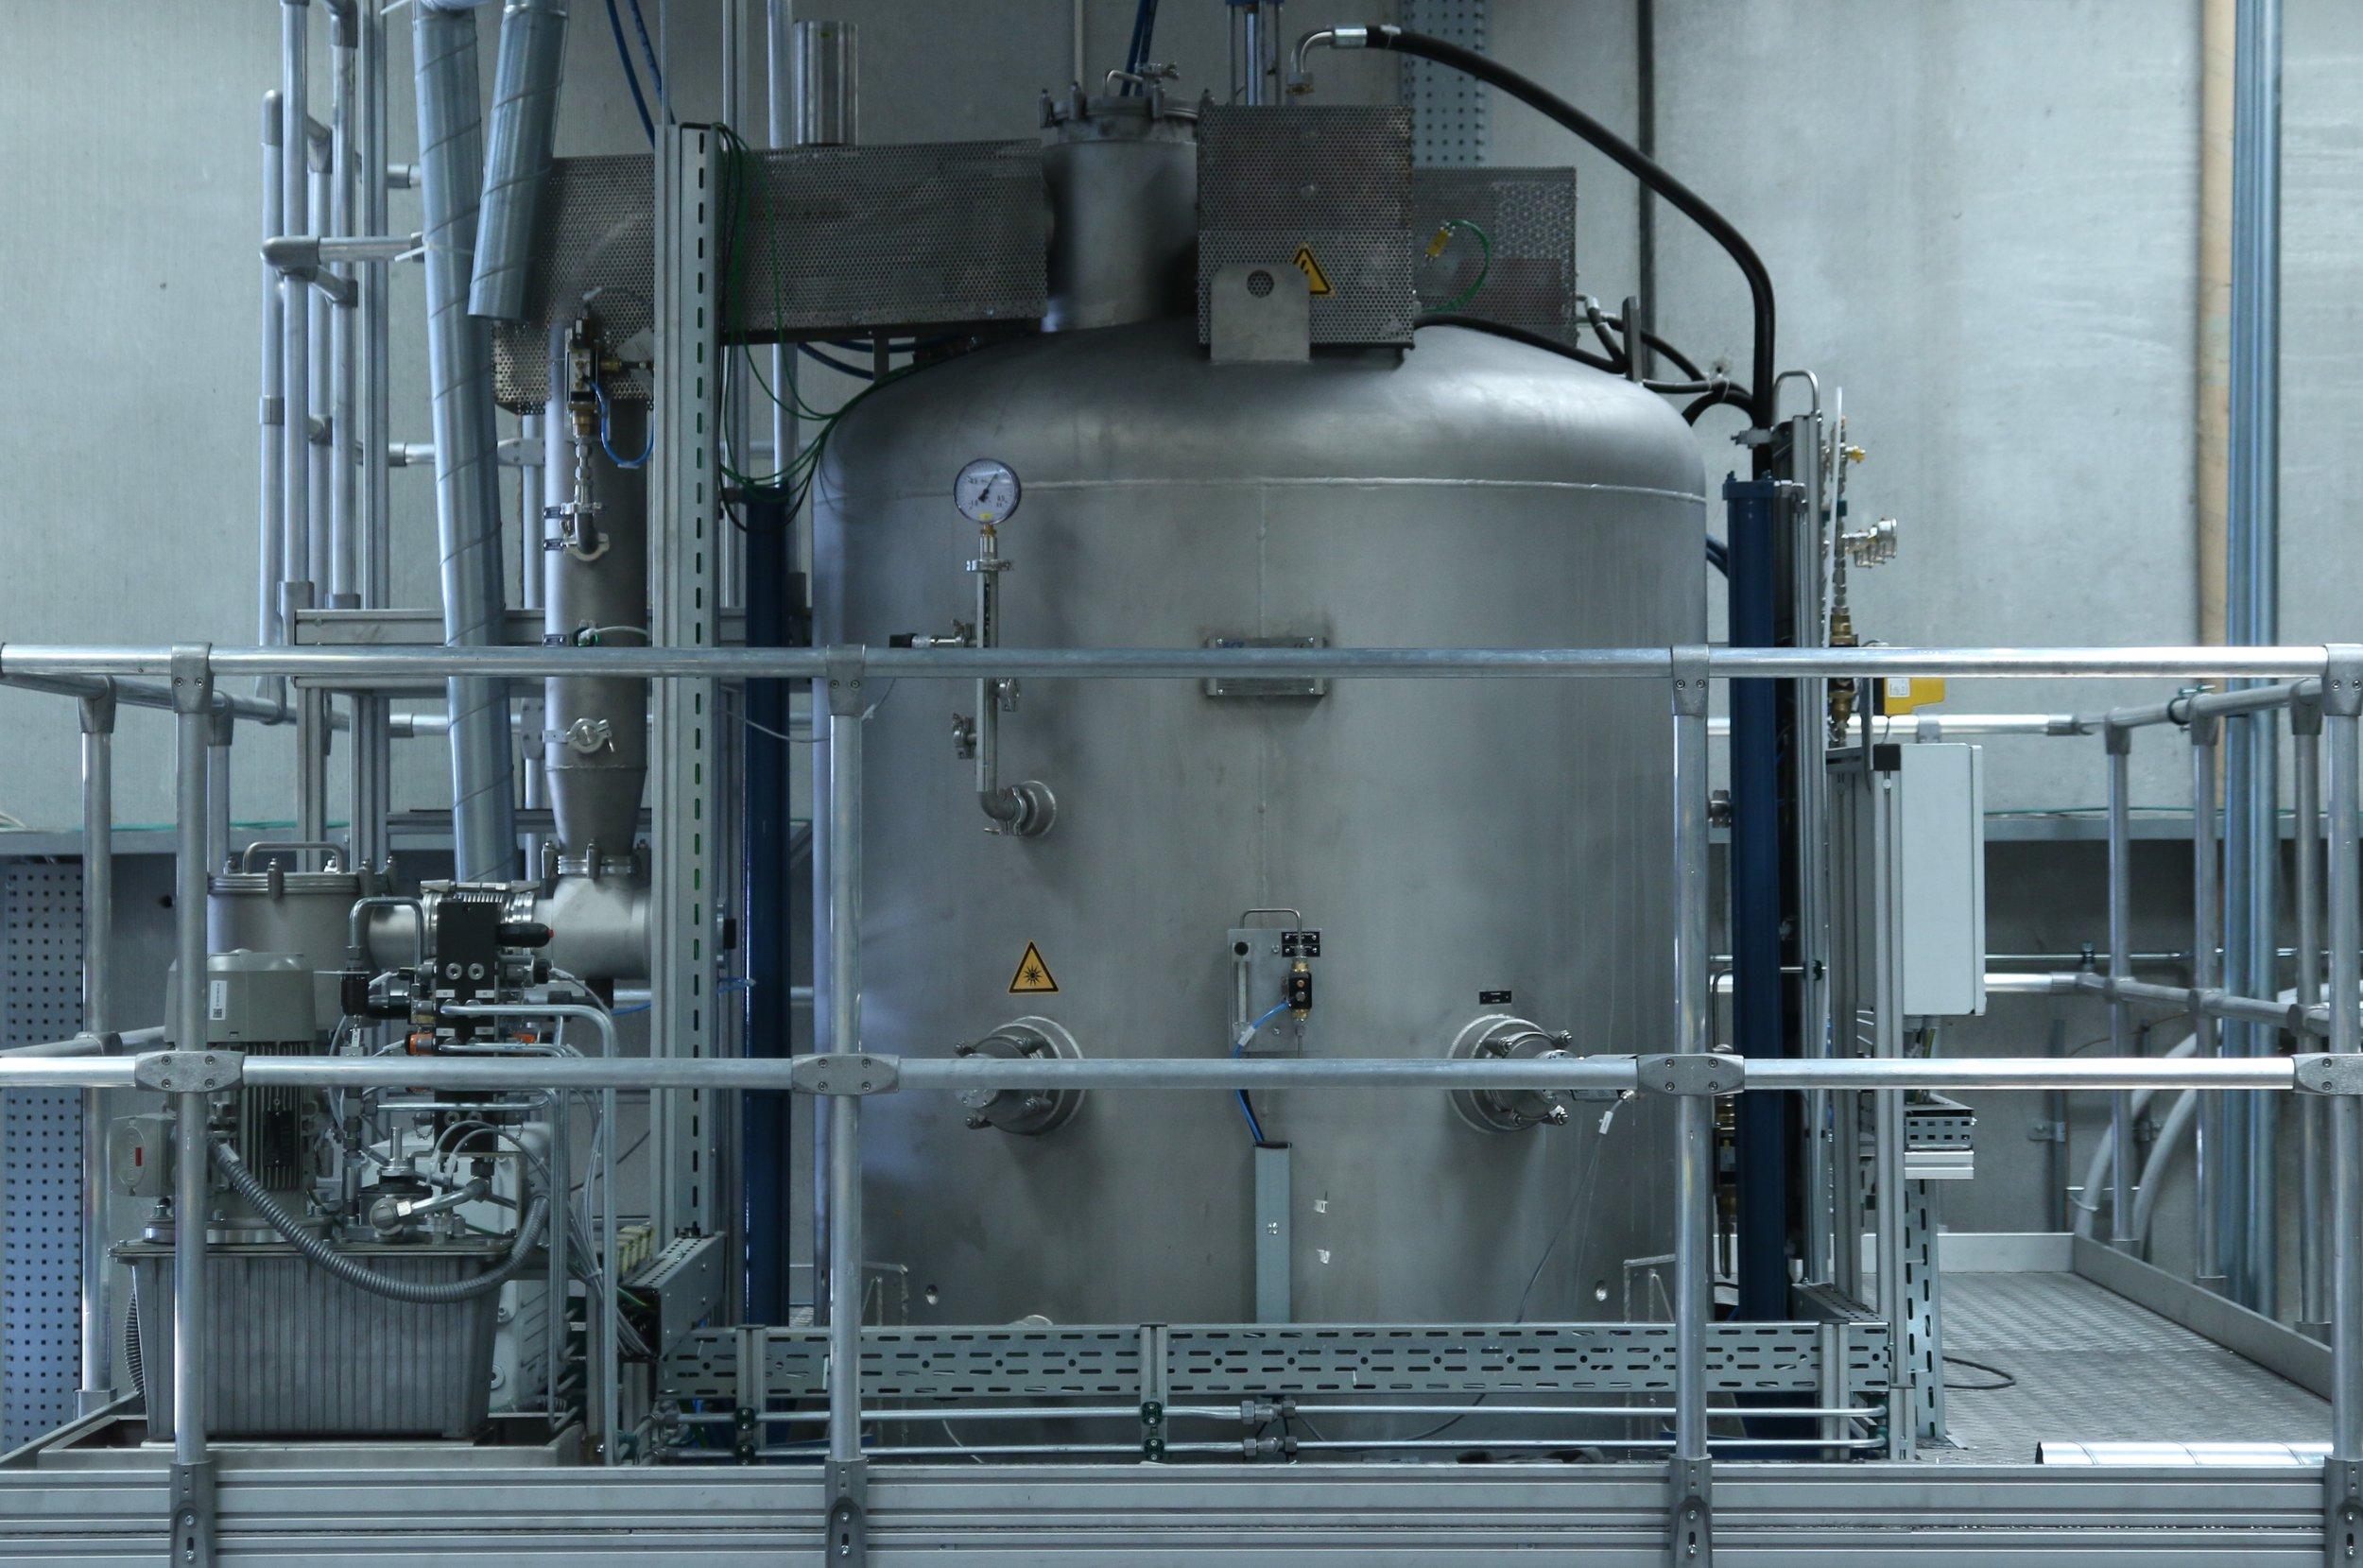 Sintering the Silicon Carbide membranes